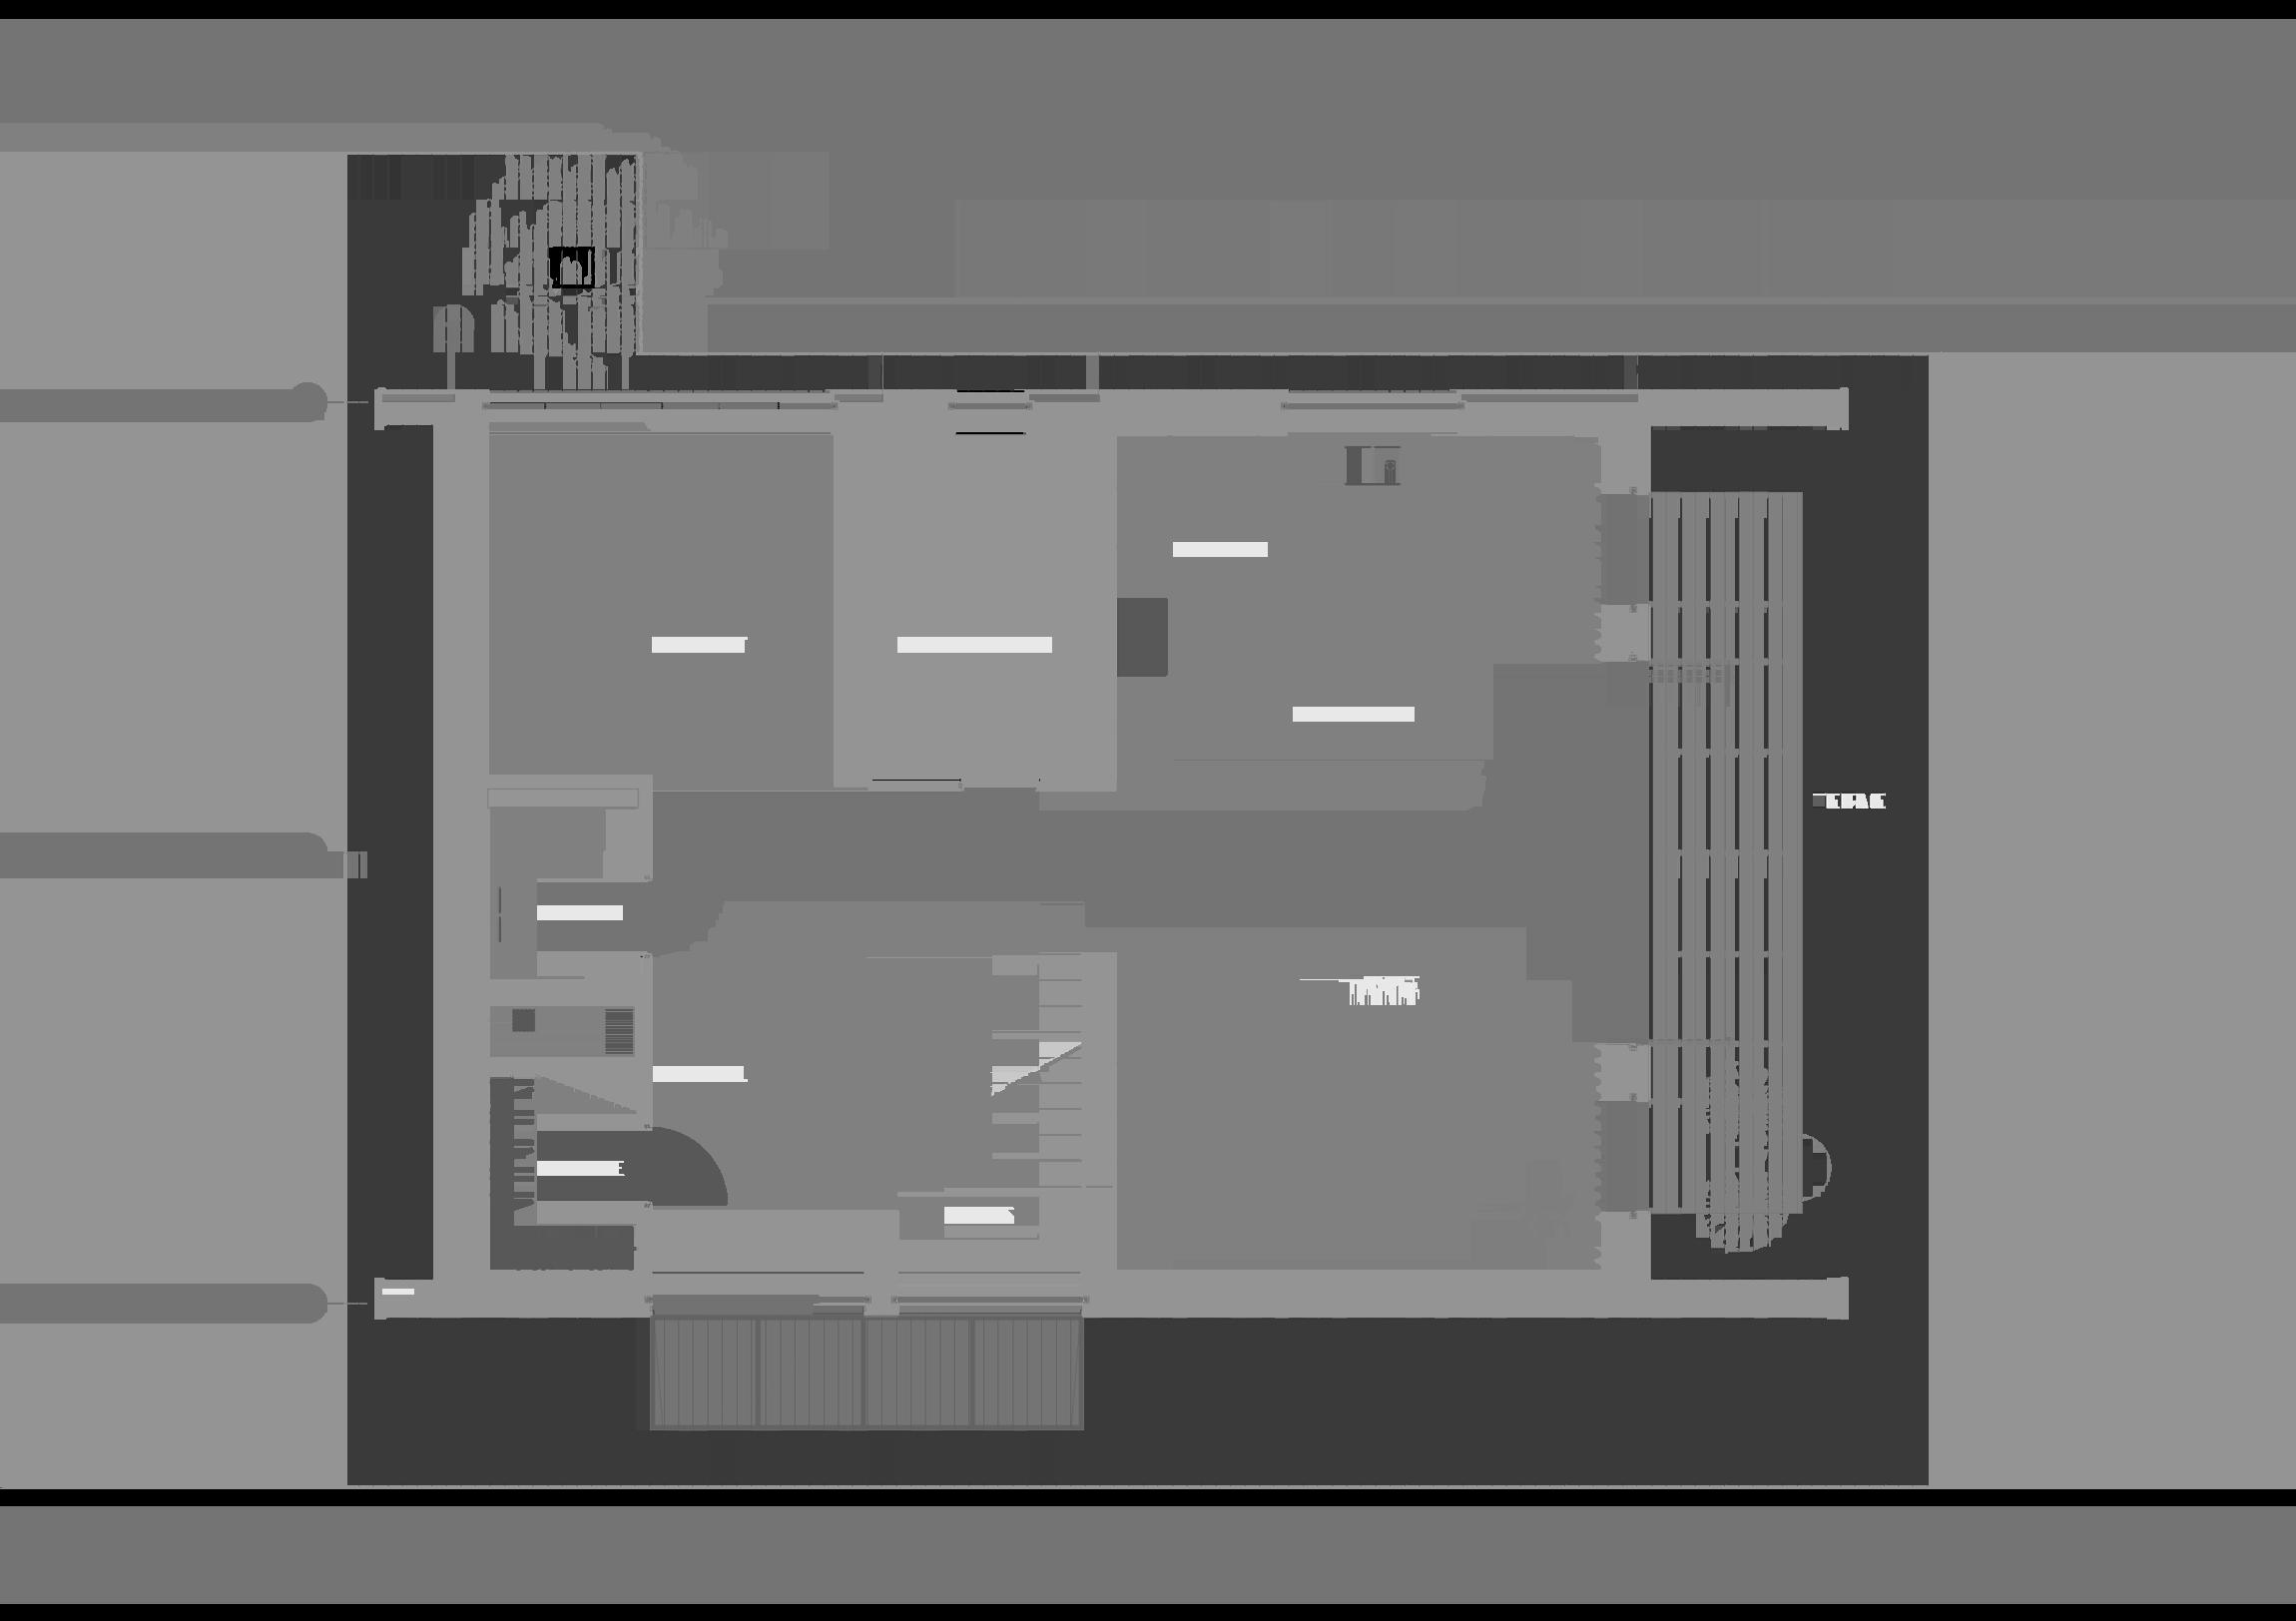 cube_plan_1